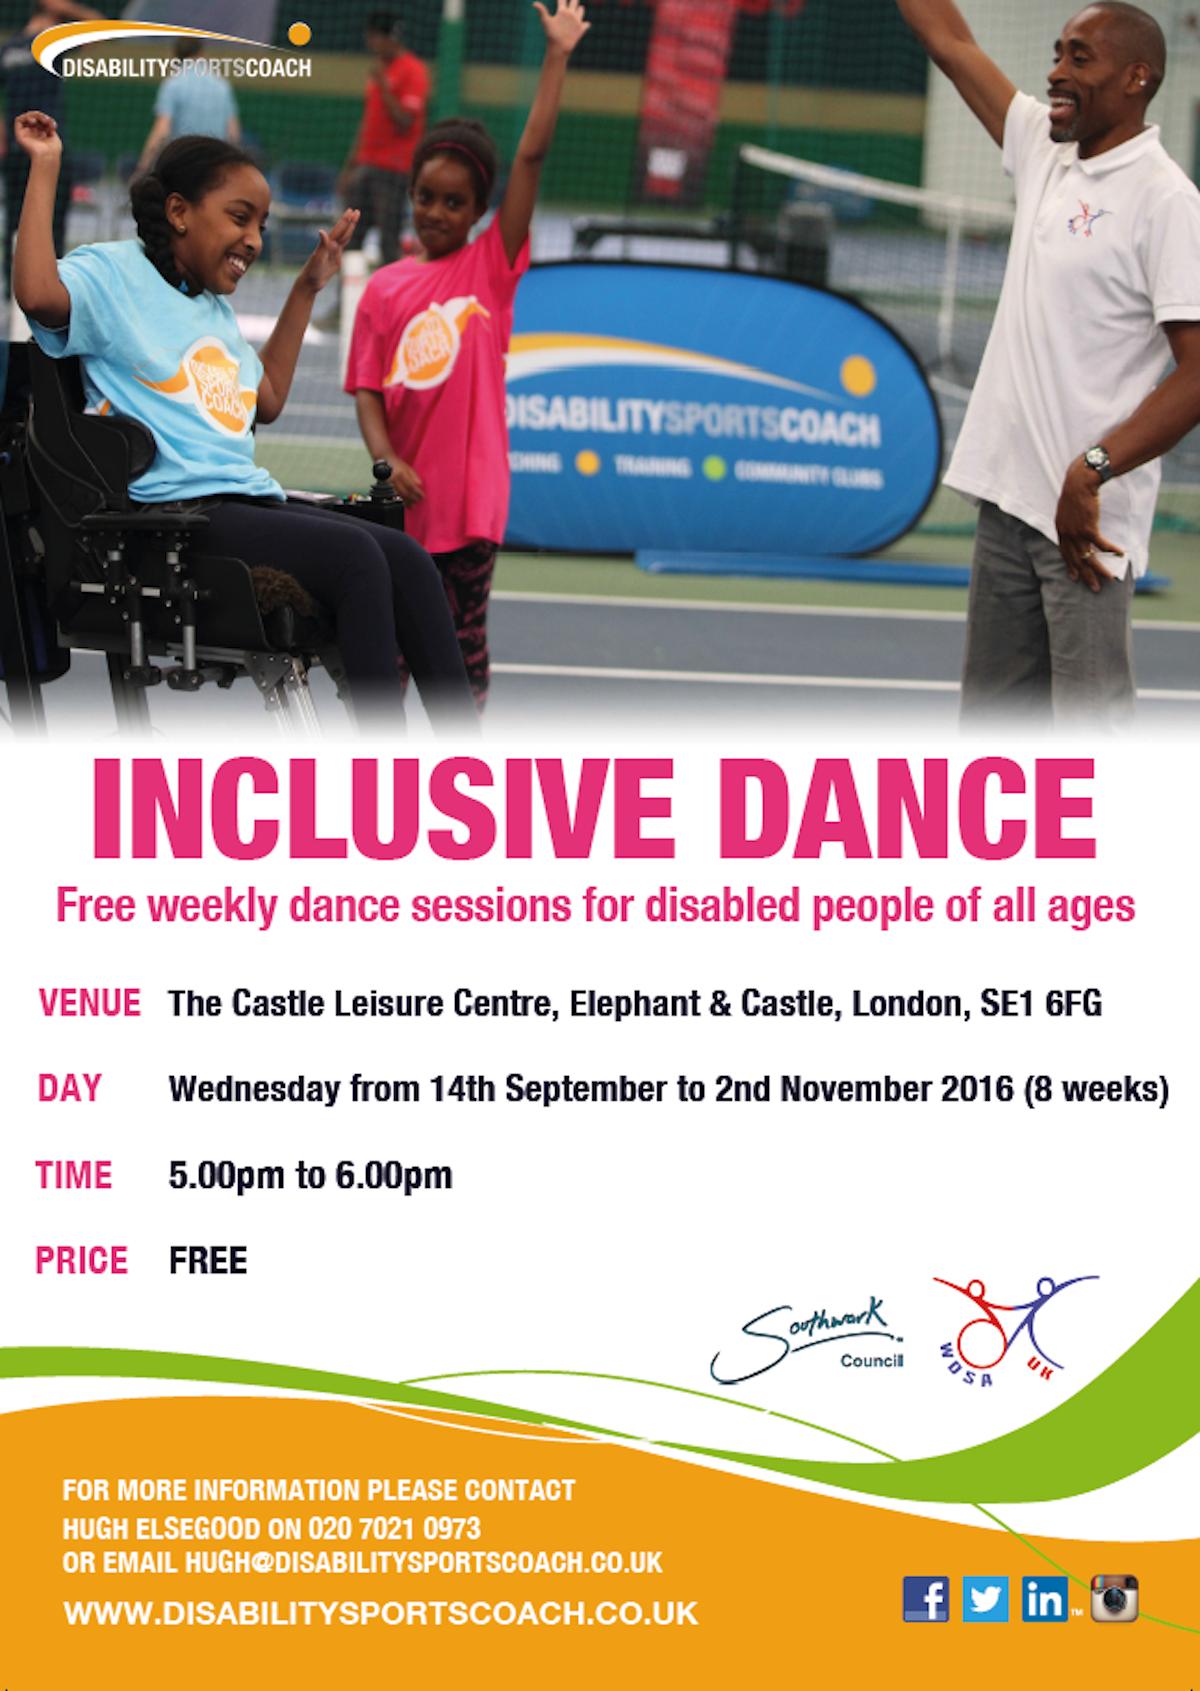 Disability Sports Coach Inclusive Dance at The Castle Leisure Centre